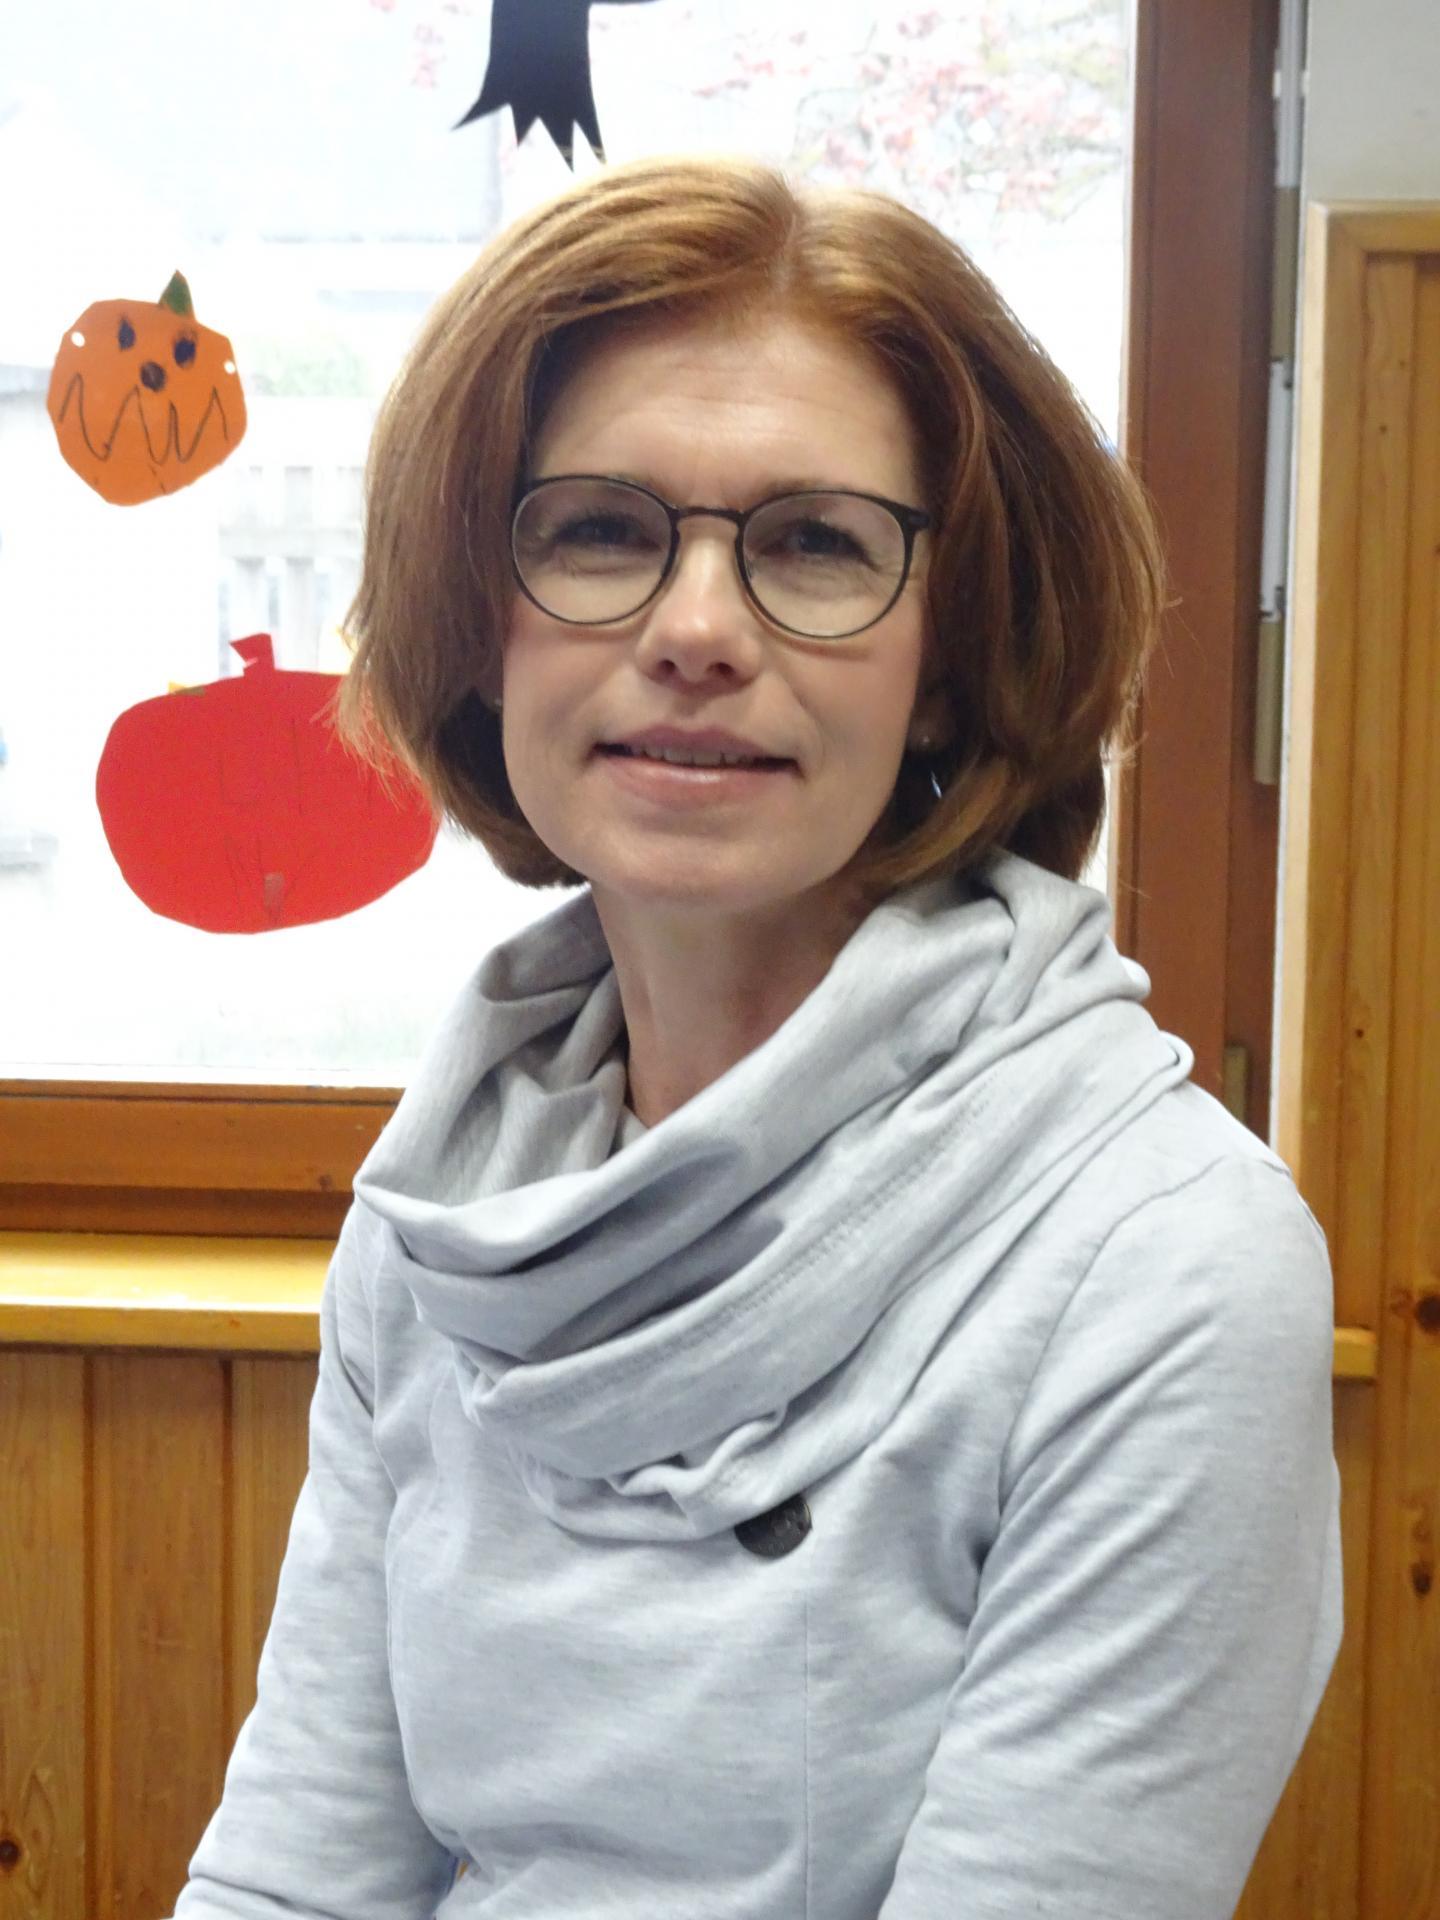 Tatjana Schindelmann